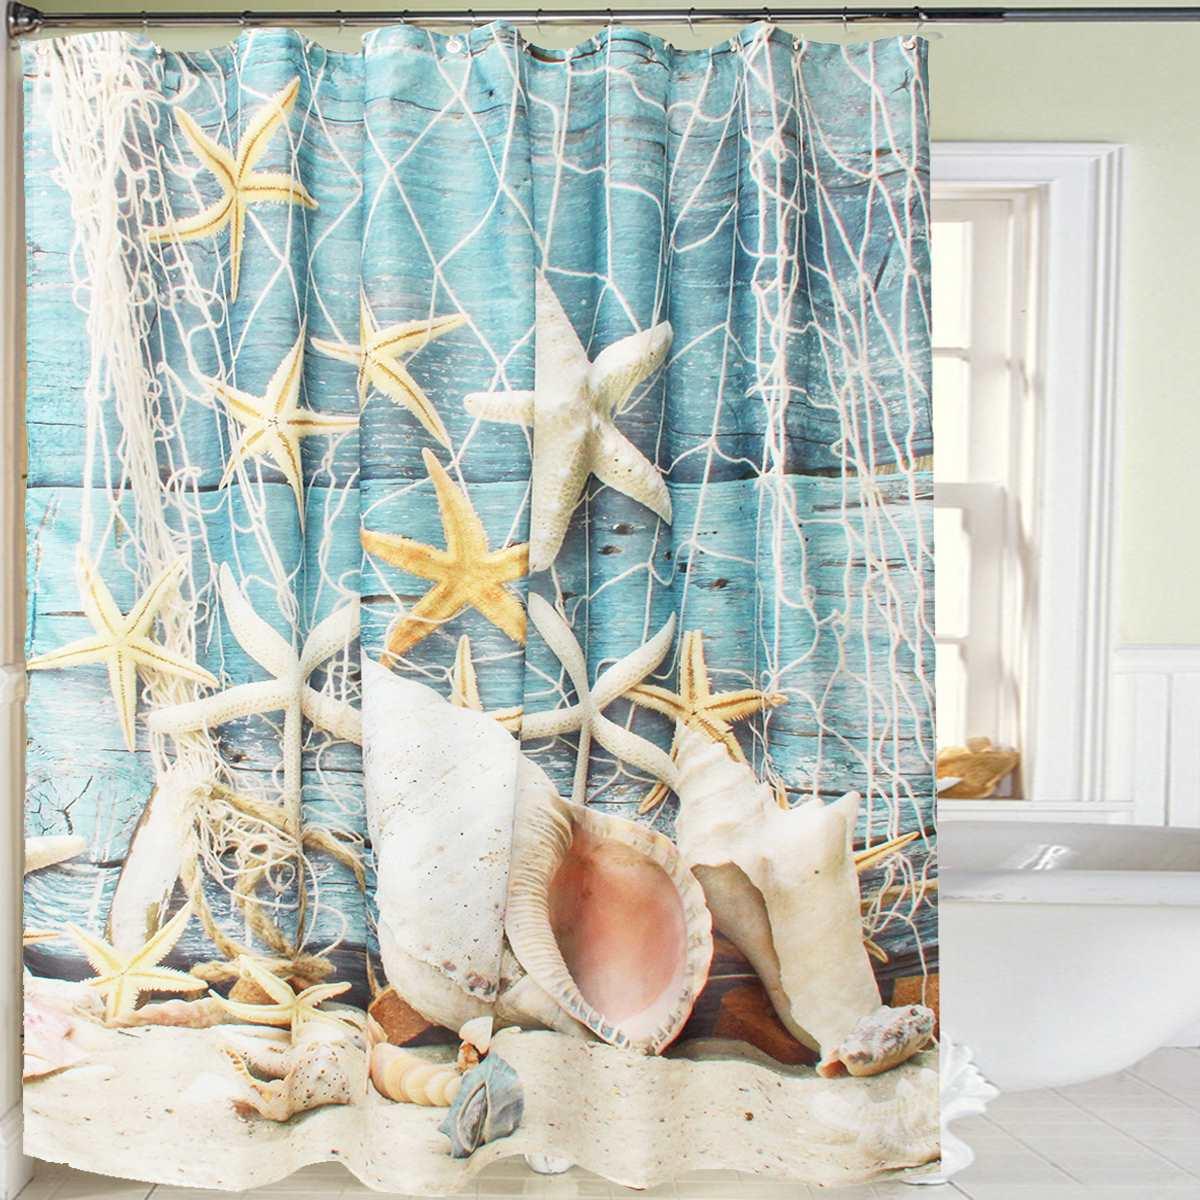 180X180cm Shell Beach Bathroom Shower Curtain Polyester Waterproof Sheer Shower Screen Hooks Home Hotel Bathroom Ornament(China (Mainland))